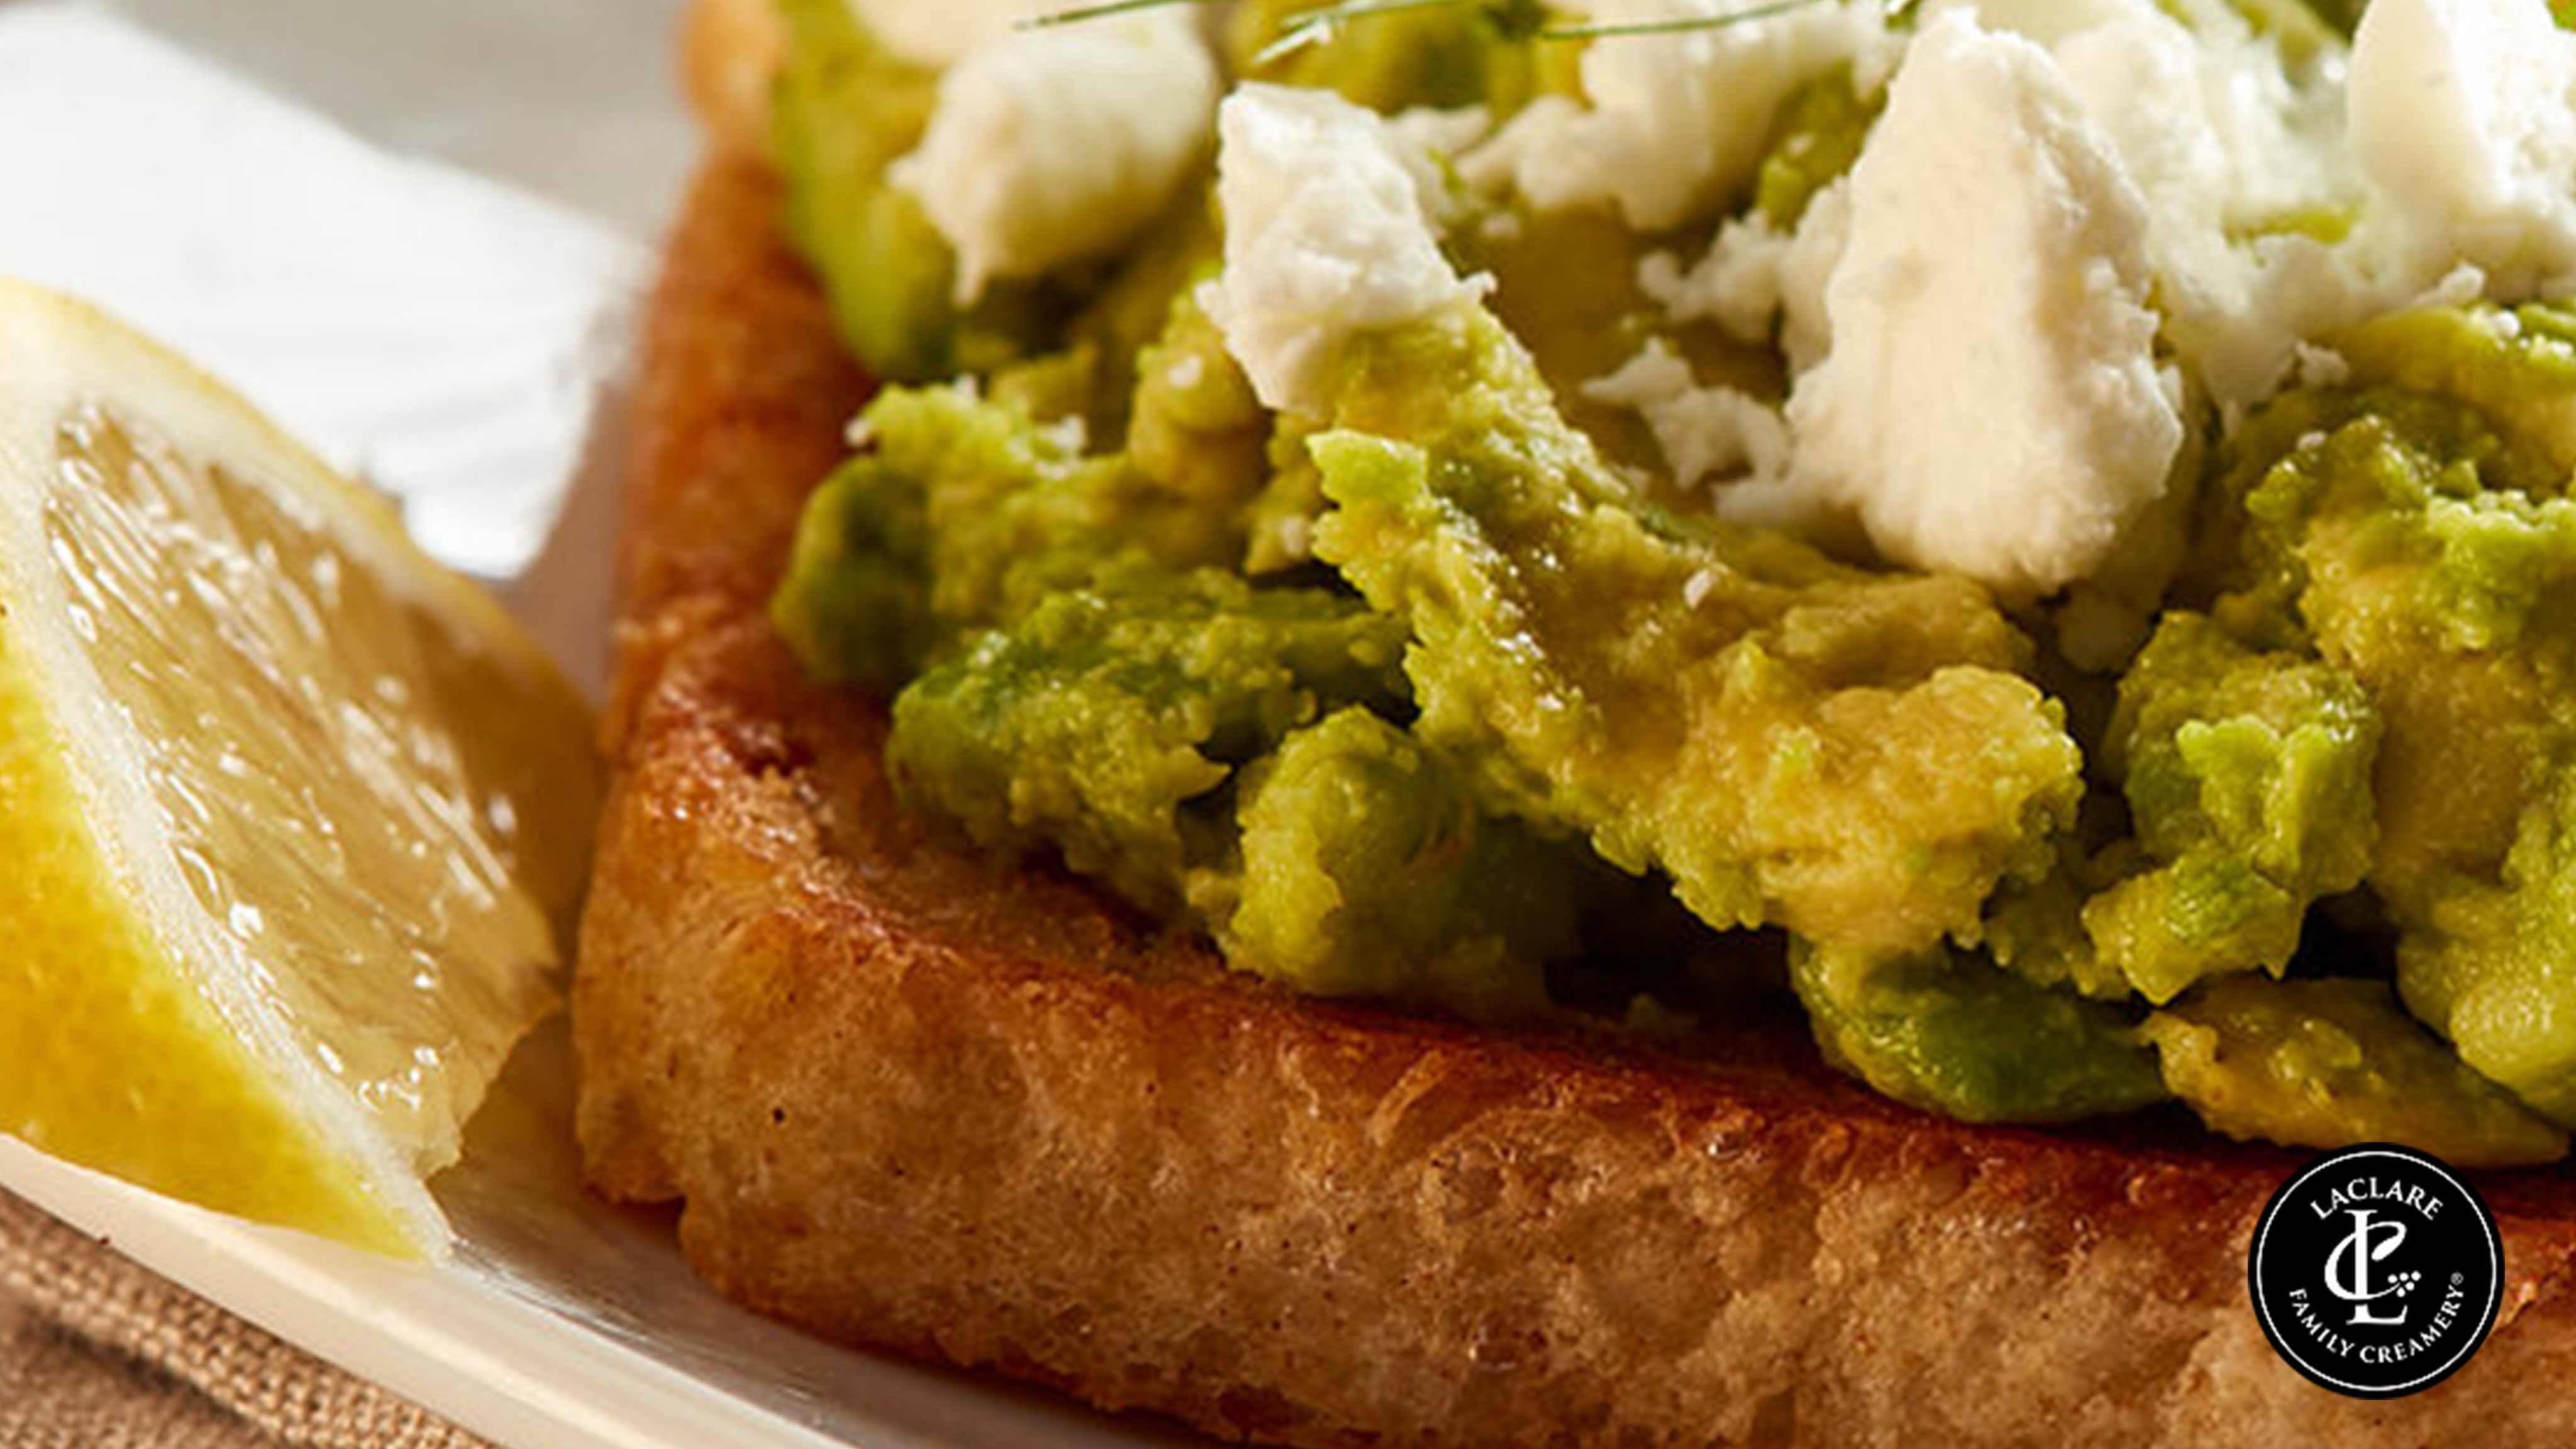 Image for Recipe Avocado Feta Toast